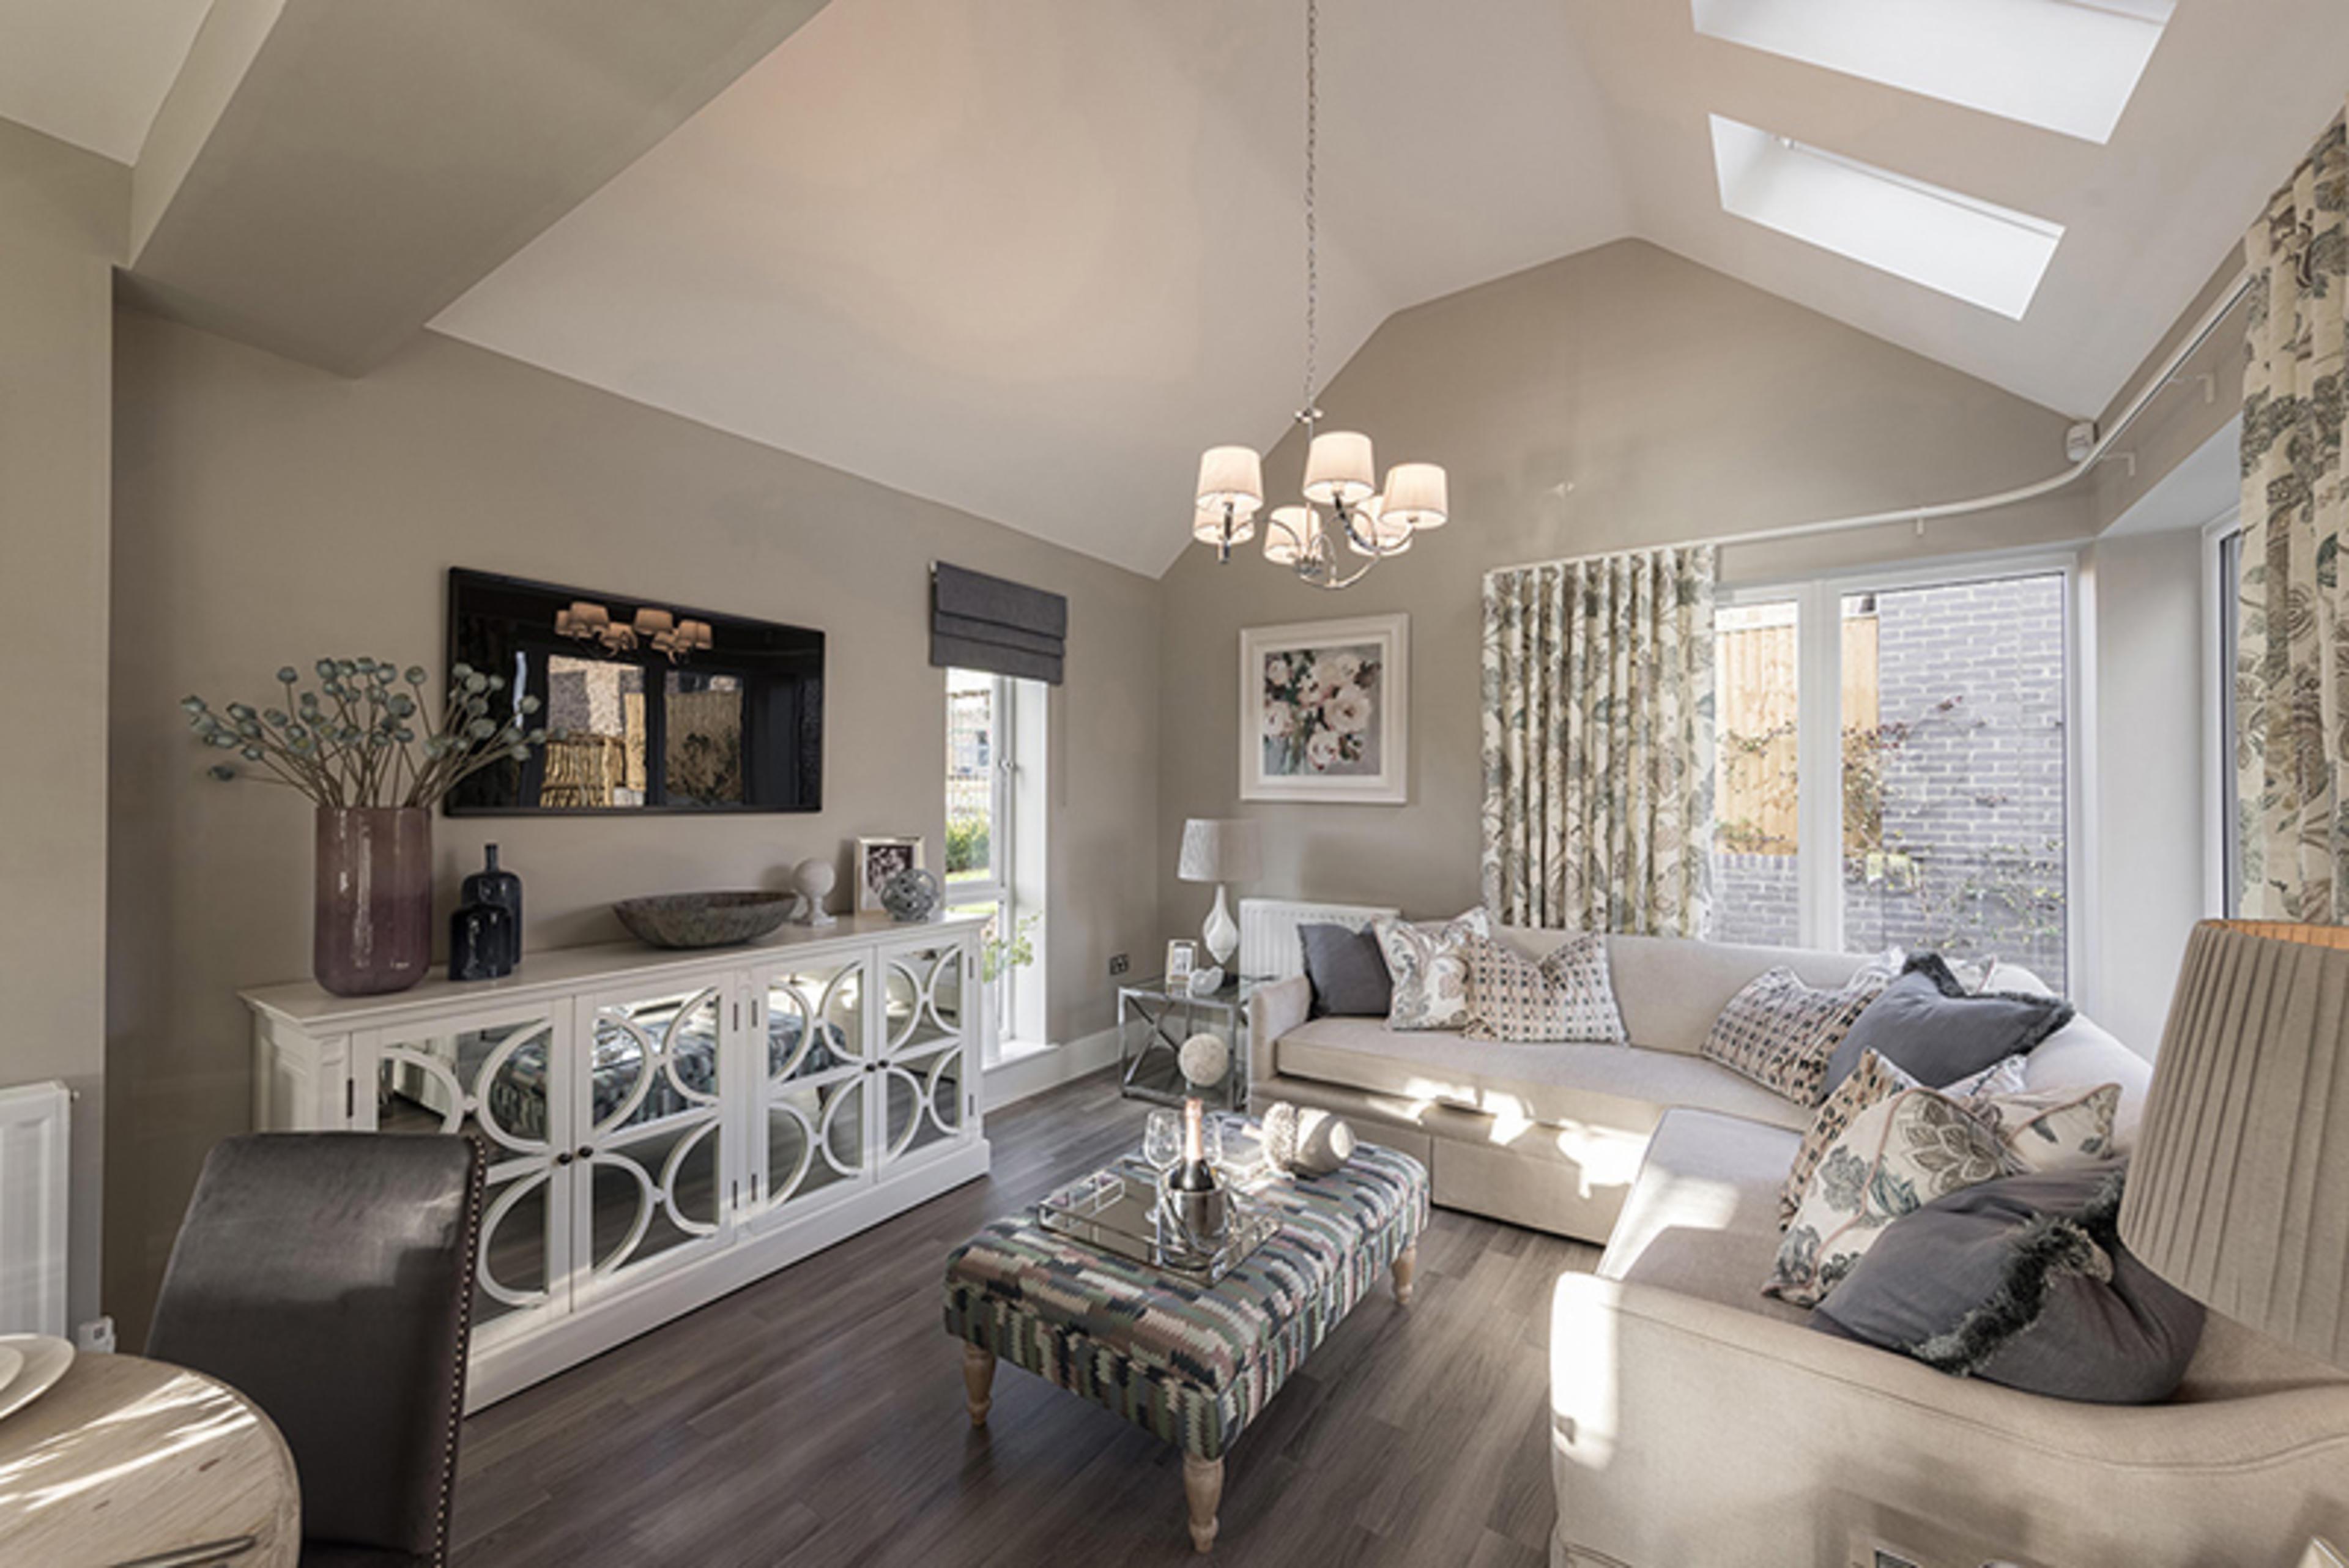 watling-grange-harrogate-calder-3-bed-home-living-room-2